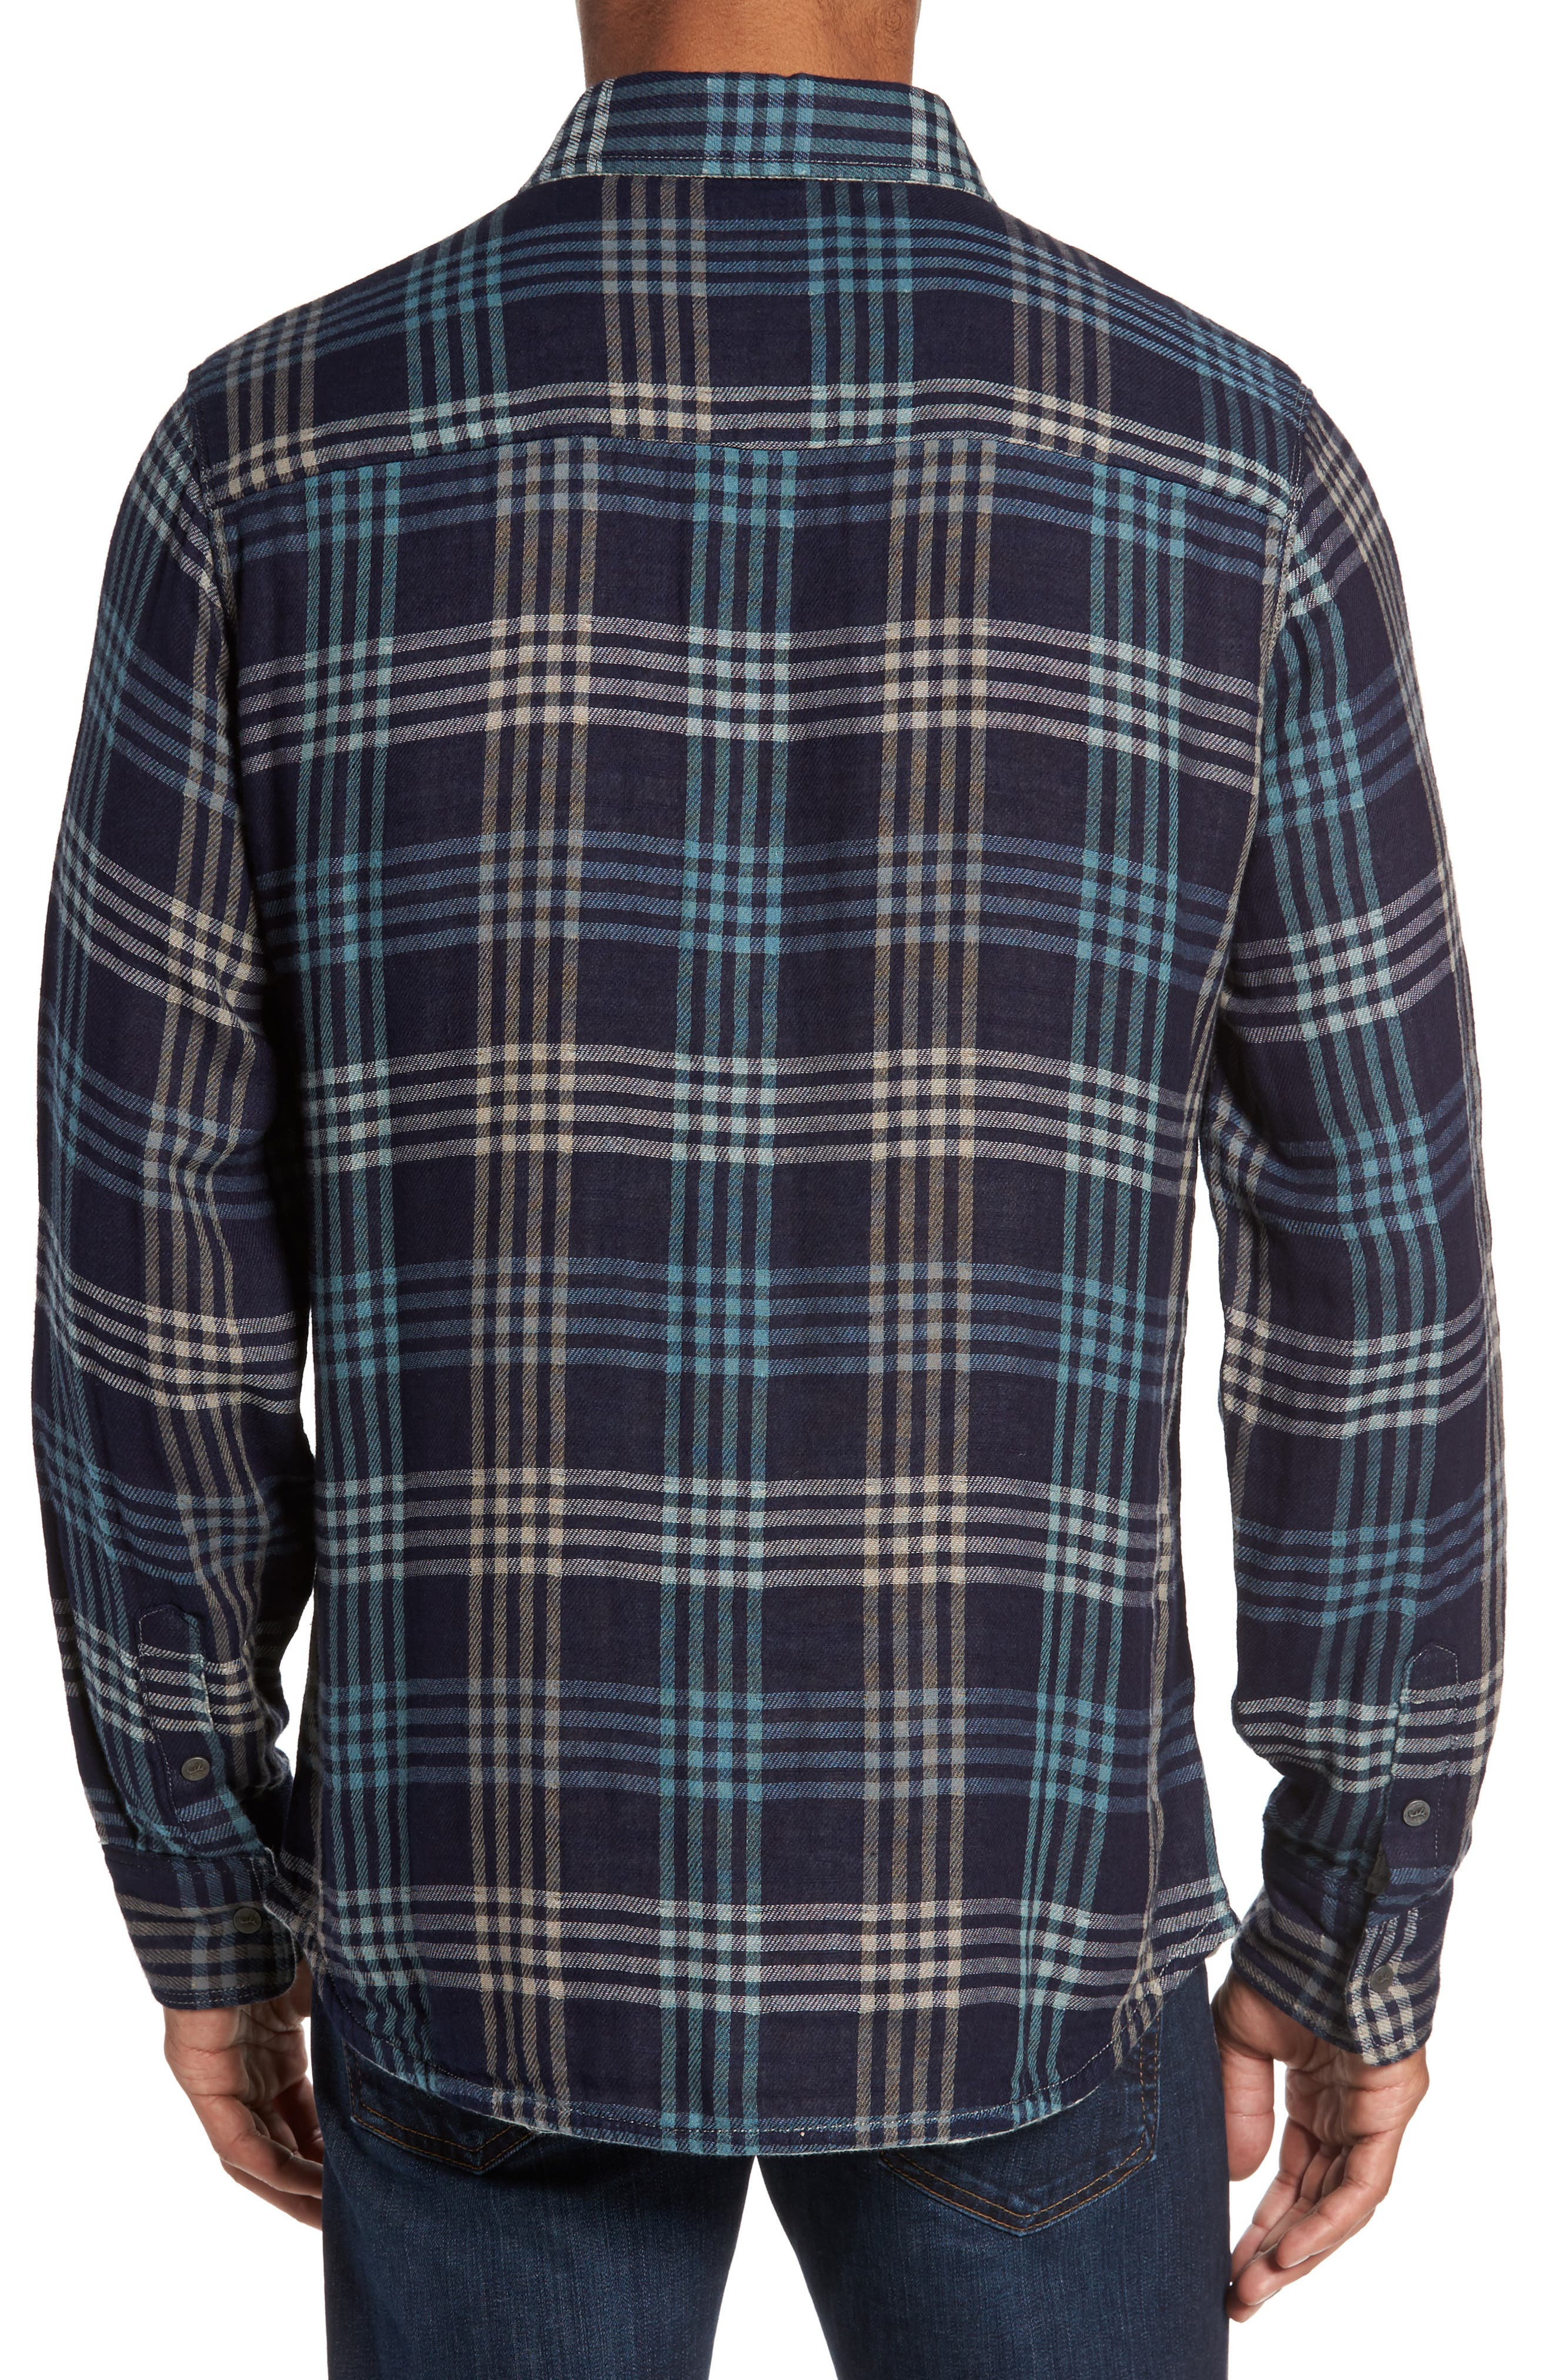 Alternate Image 3  - Jeremiah Cypress Reversible Twill Shirt